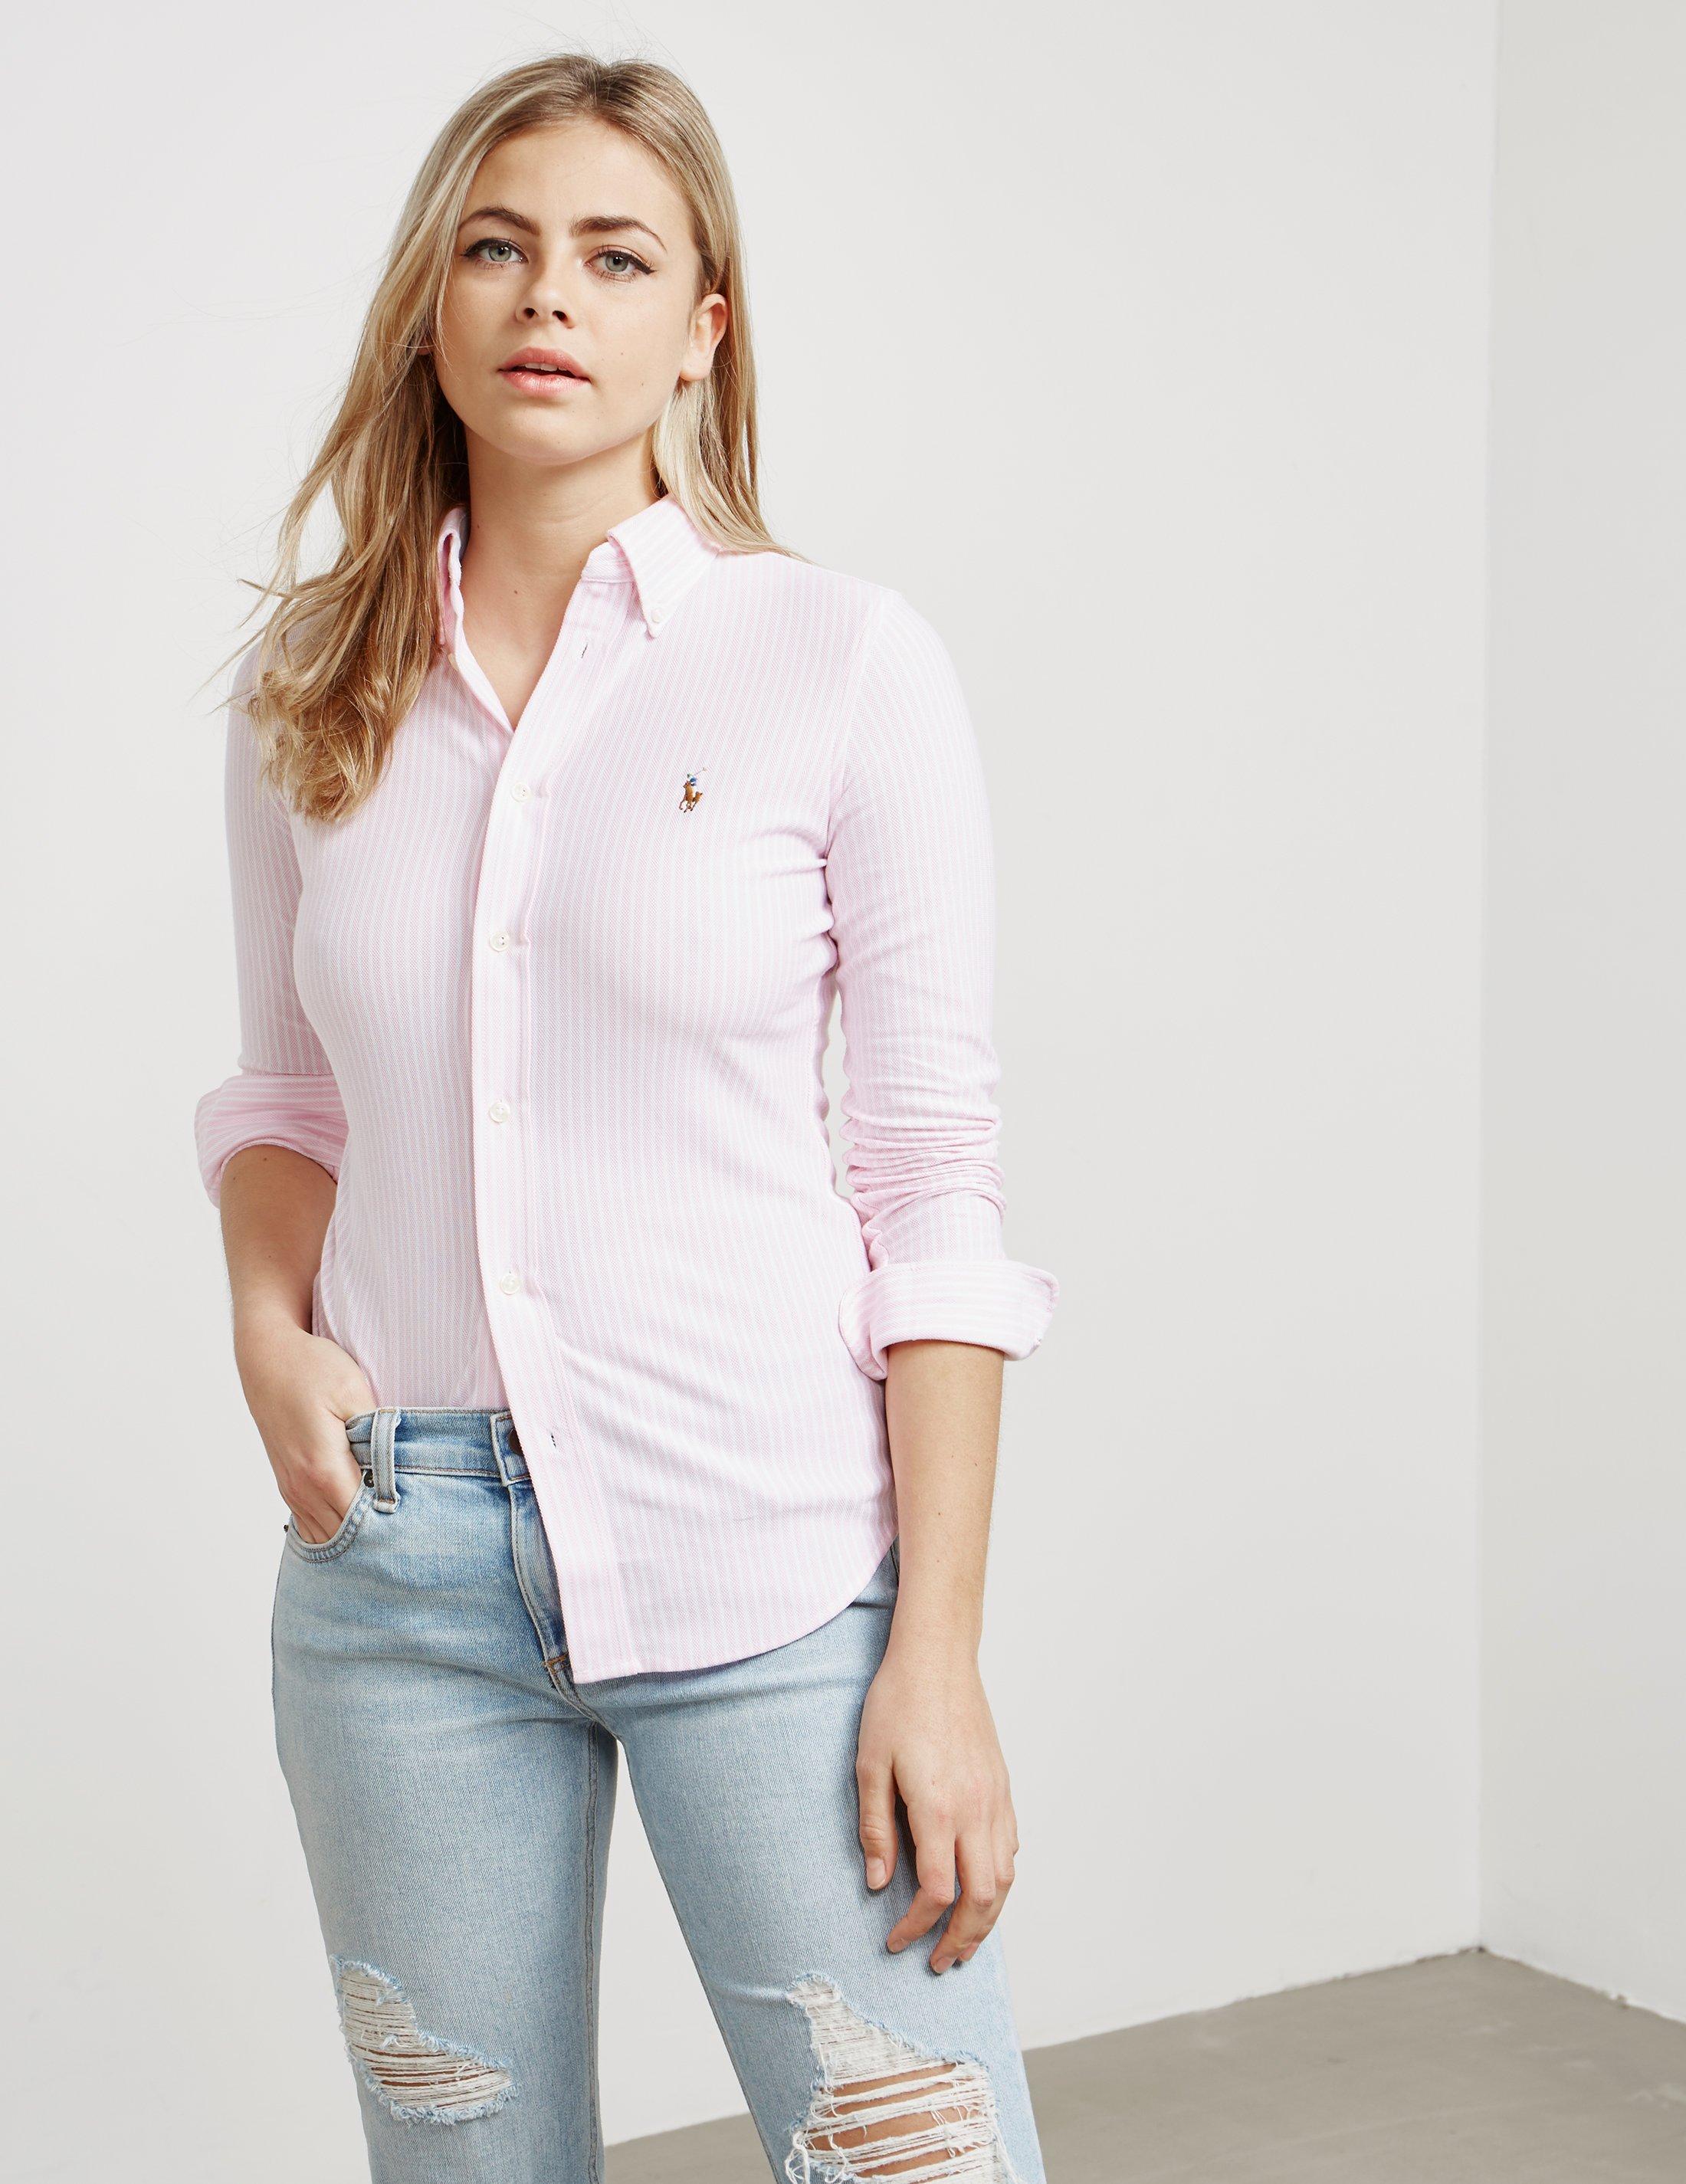 548adebcf56 Lyst - Polo Ralph Lauren Heidi Long Sleeve Shirt Pink in Pink